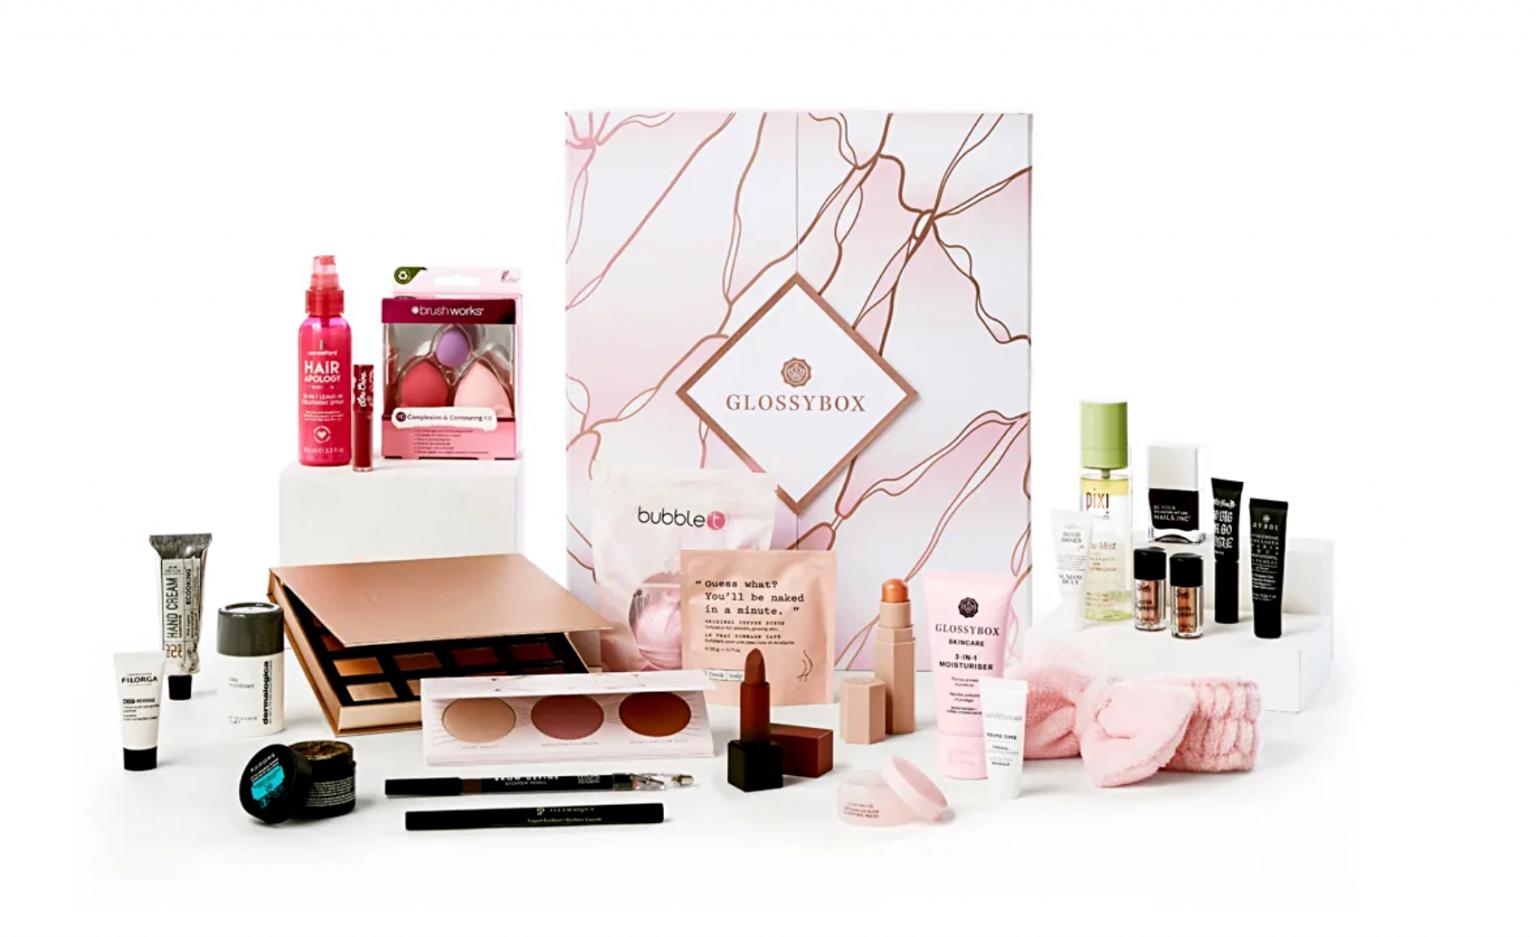 Pin By 485748 On Beauty Advent Calendar In 2020 Beauty Advent Calendar Best Beauty Advent Calendar Glossybox